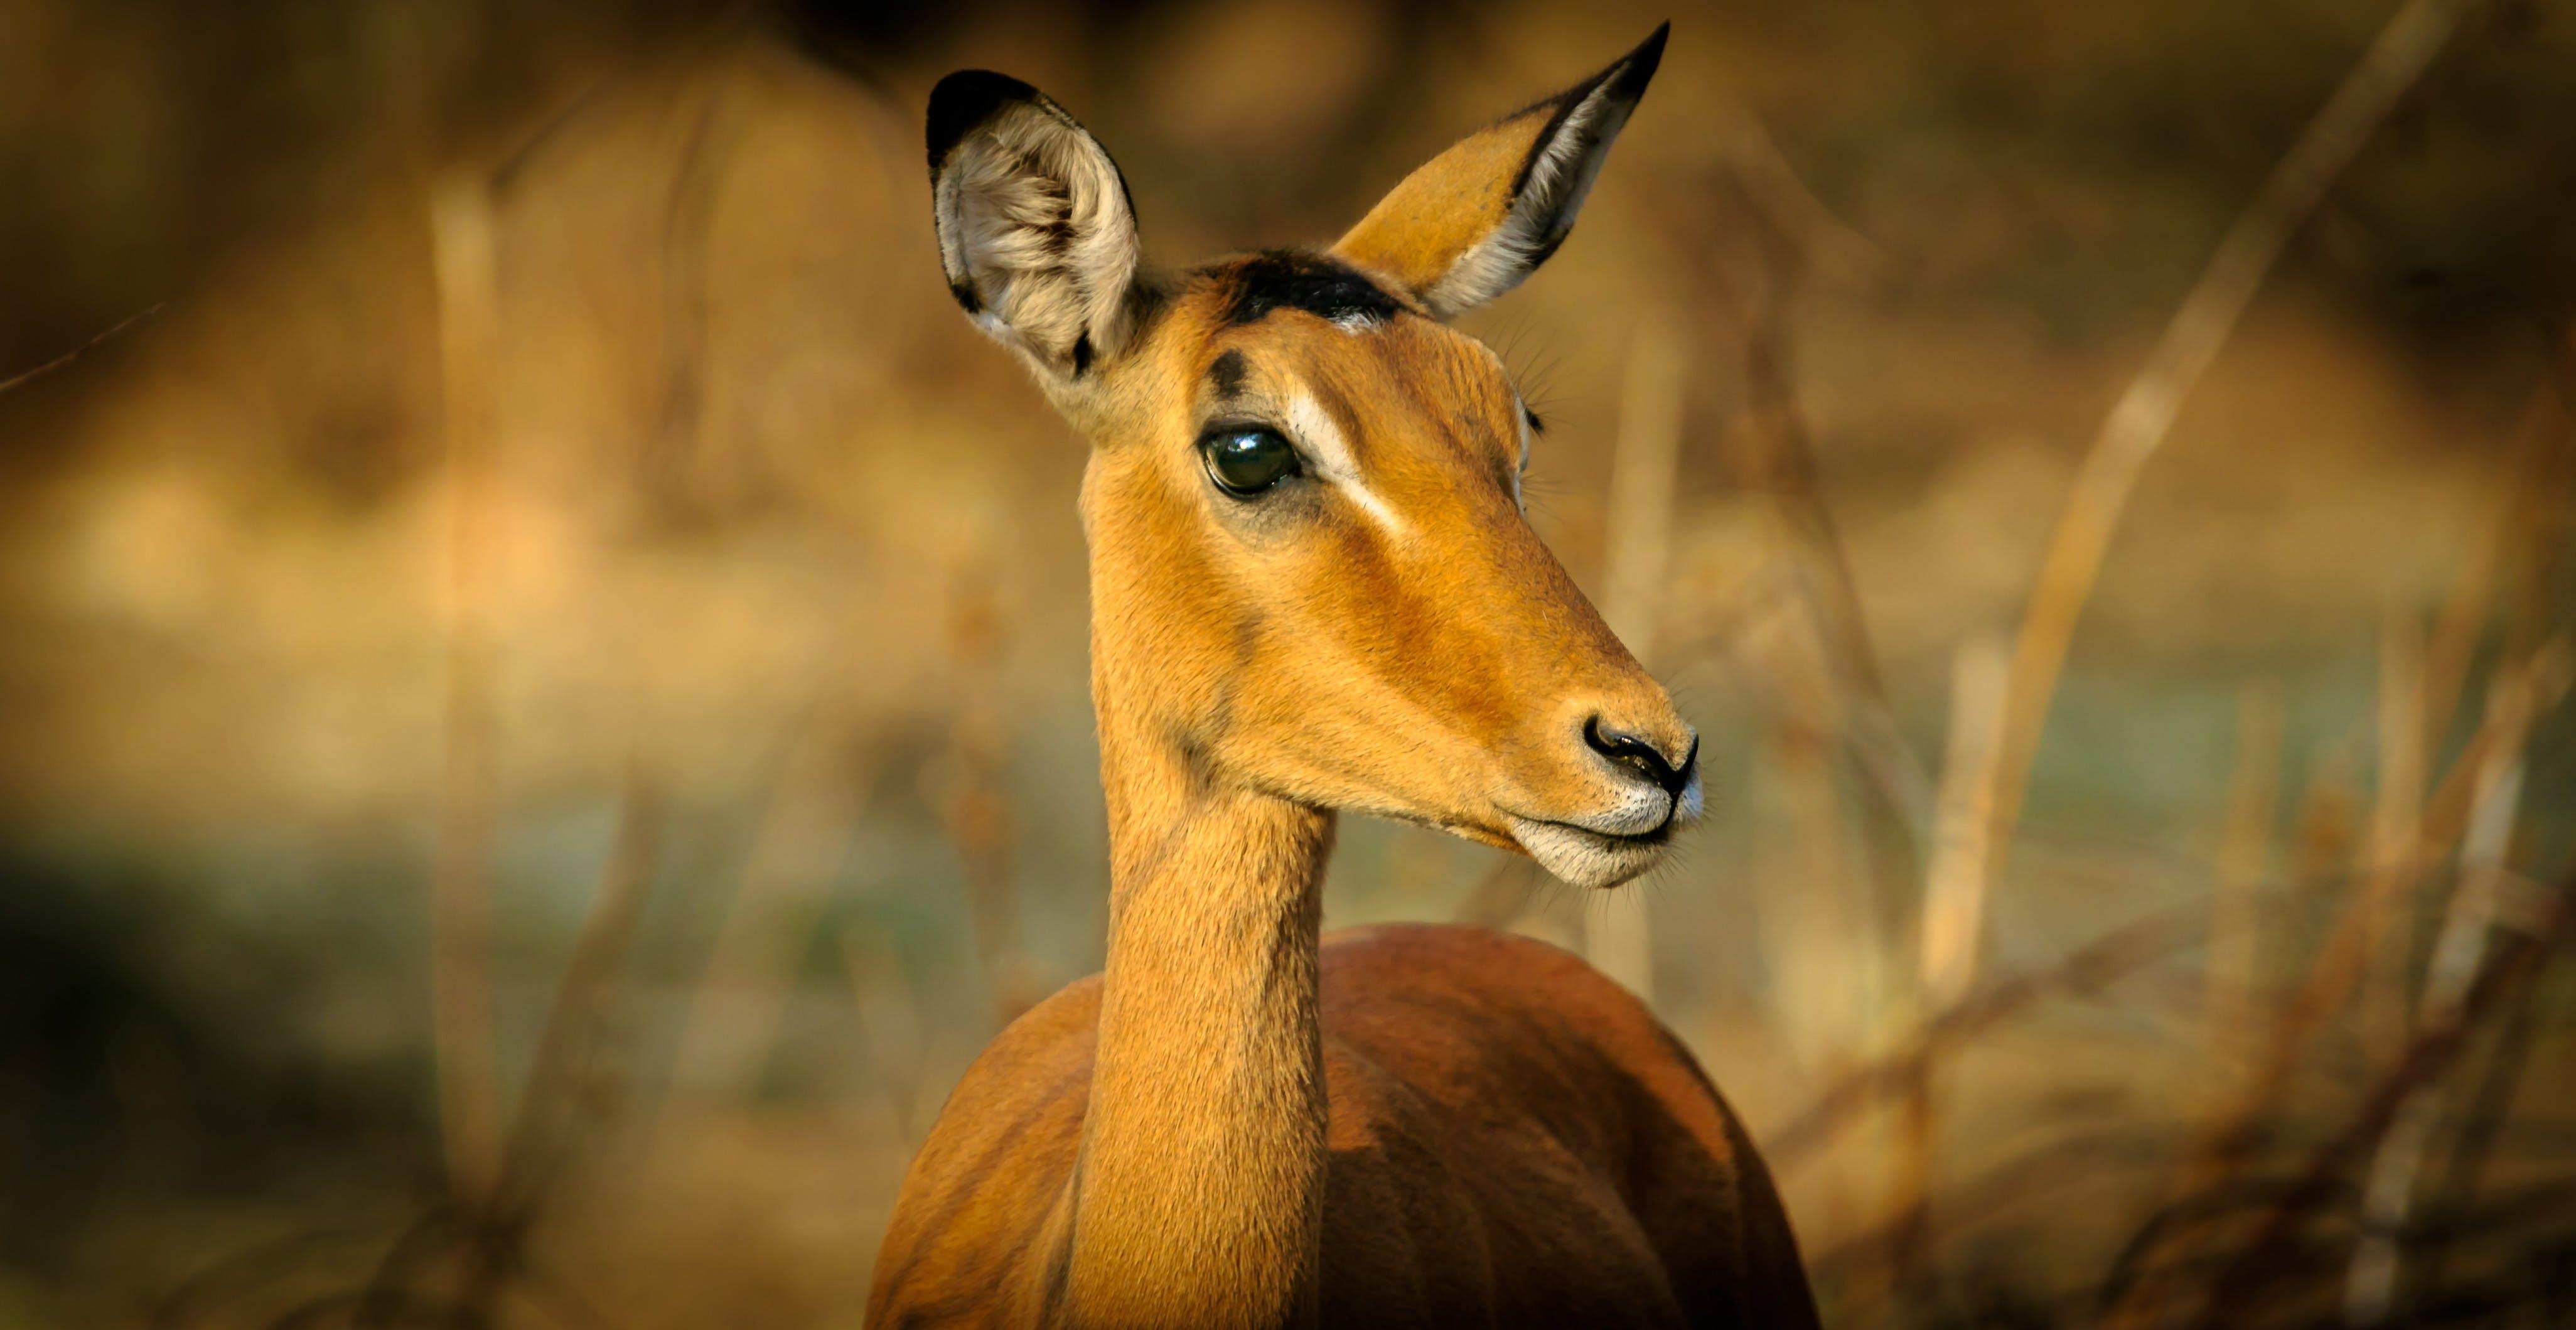 Closeup Photography Of Animal At Daytime